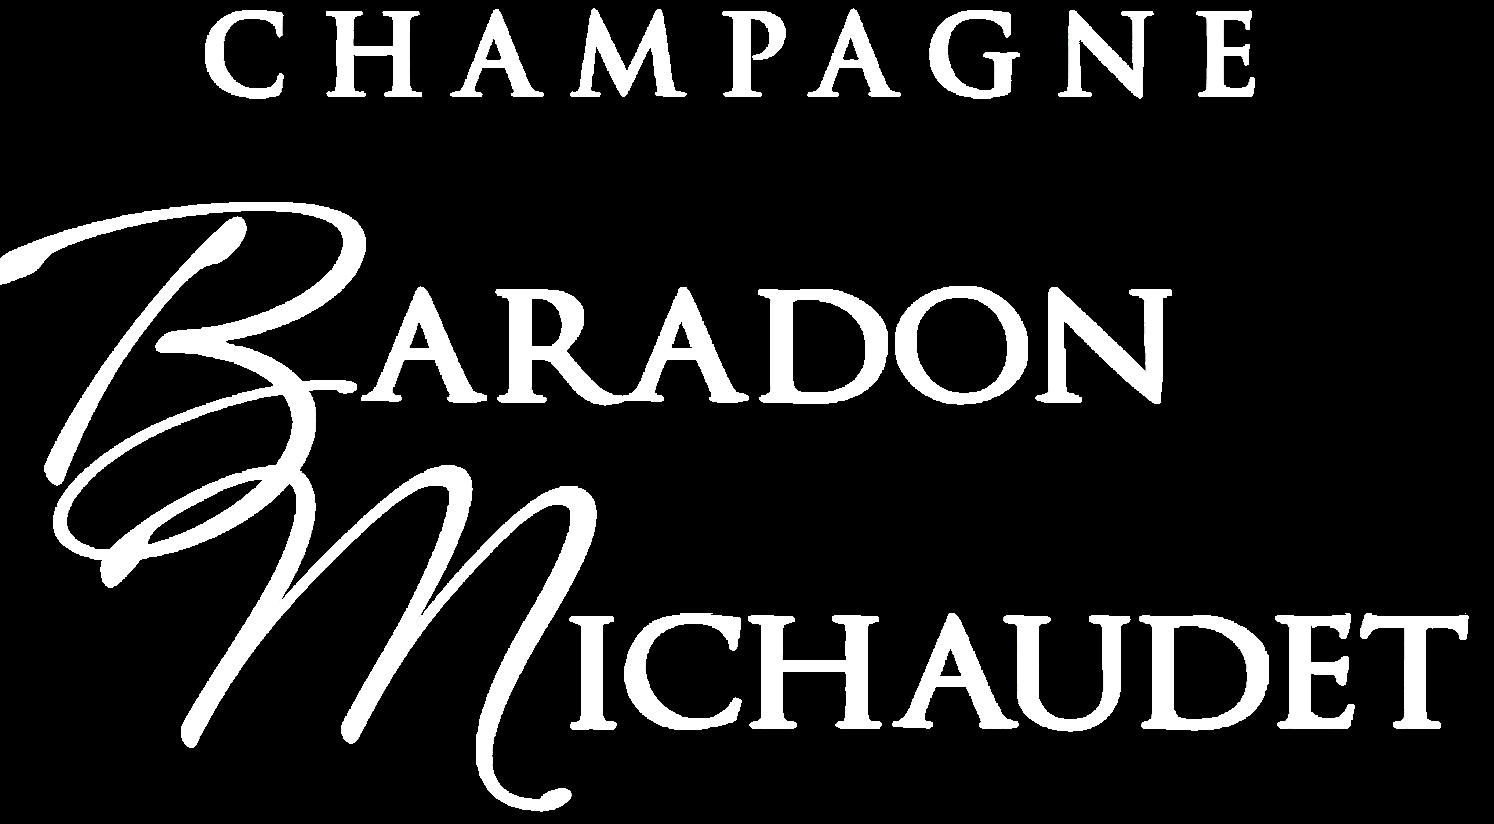 Champagne Baradon-Michaudet